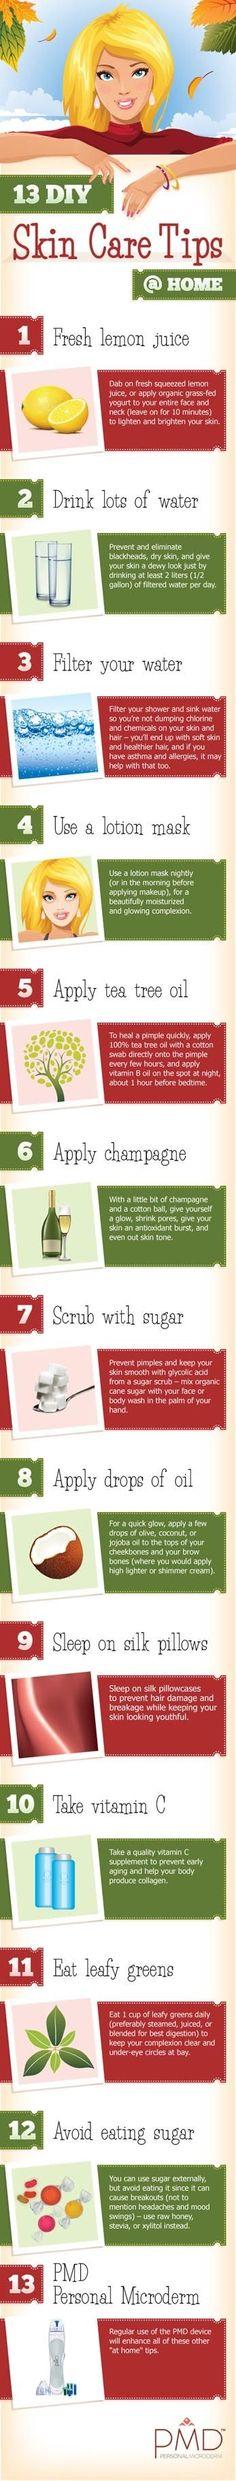 13 Recipes for diy skin care by eva.victoria1